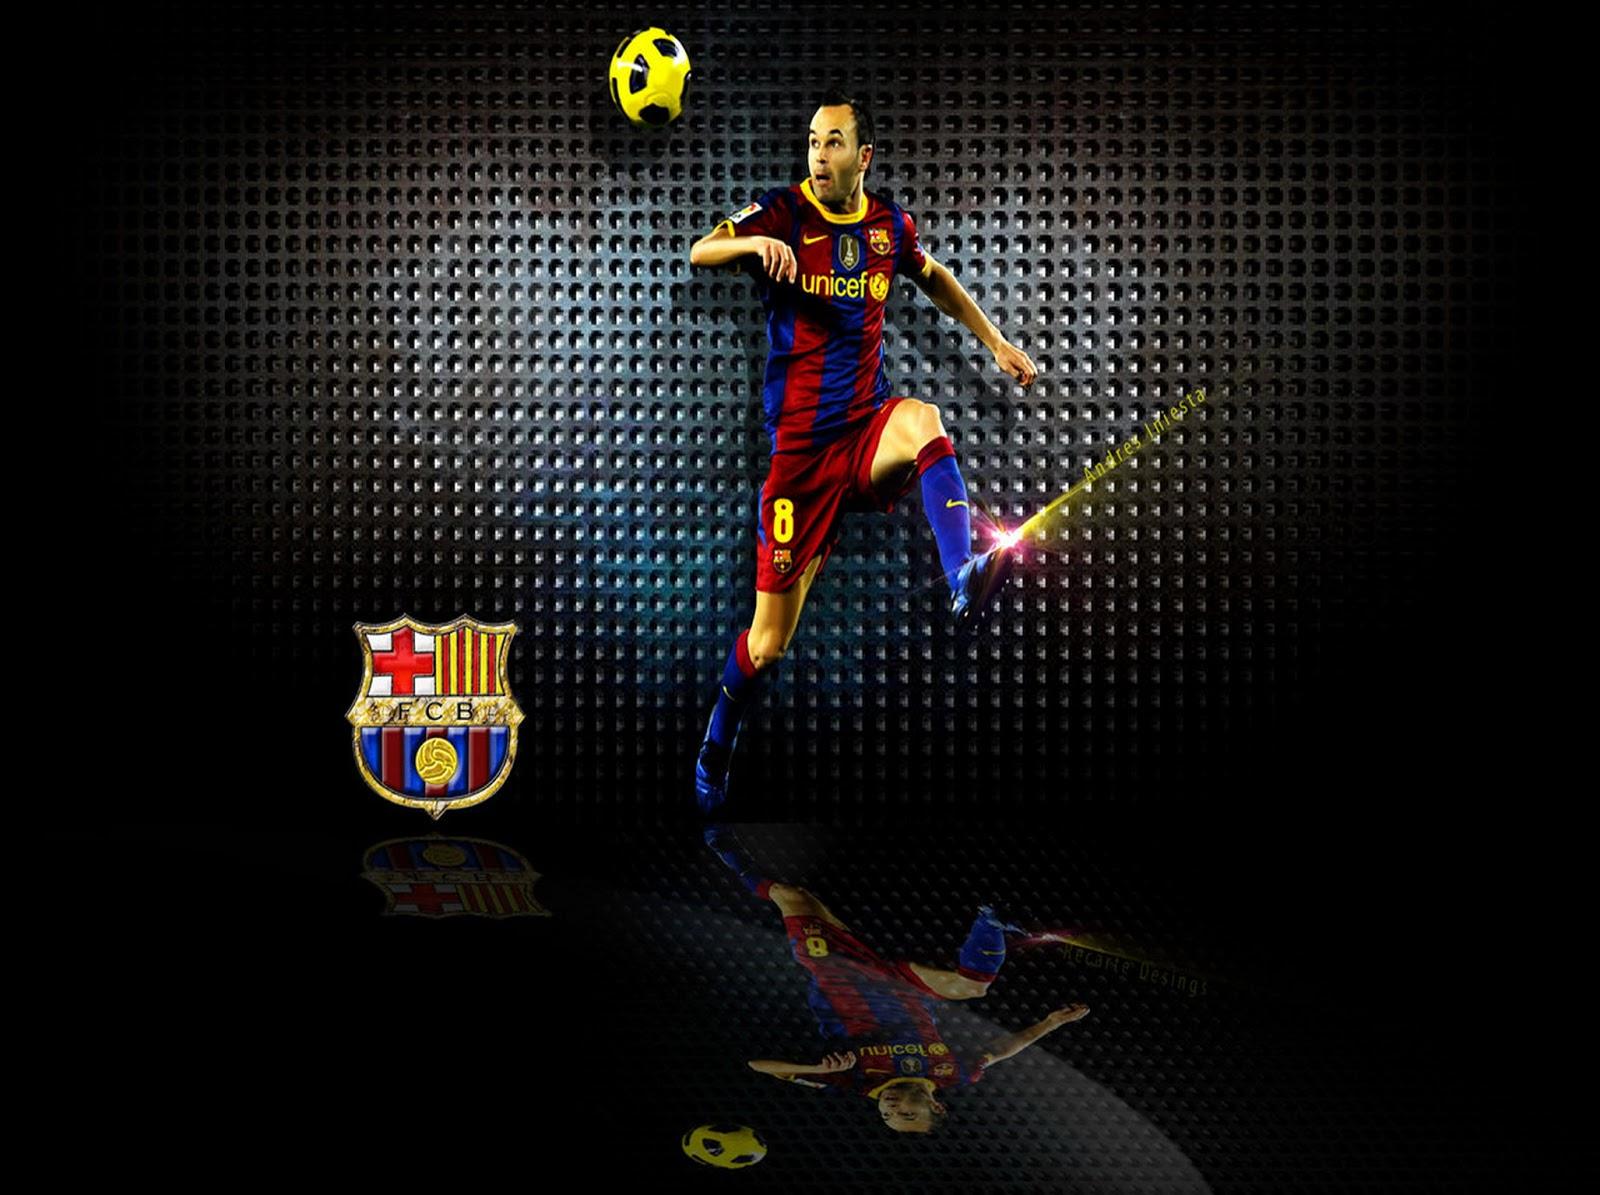 http://3.bp.blogspot.com/-7ykhj72Tdt4/UHWQefwKTOI/AAAAAAAAD8c/kFKv34X_i5U/s1600/FC+Barcelona+hd+wallpaper+2012-2013+14.jpg